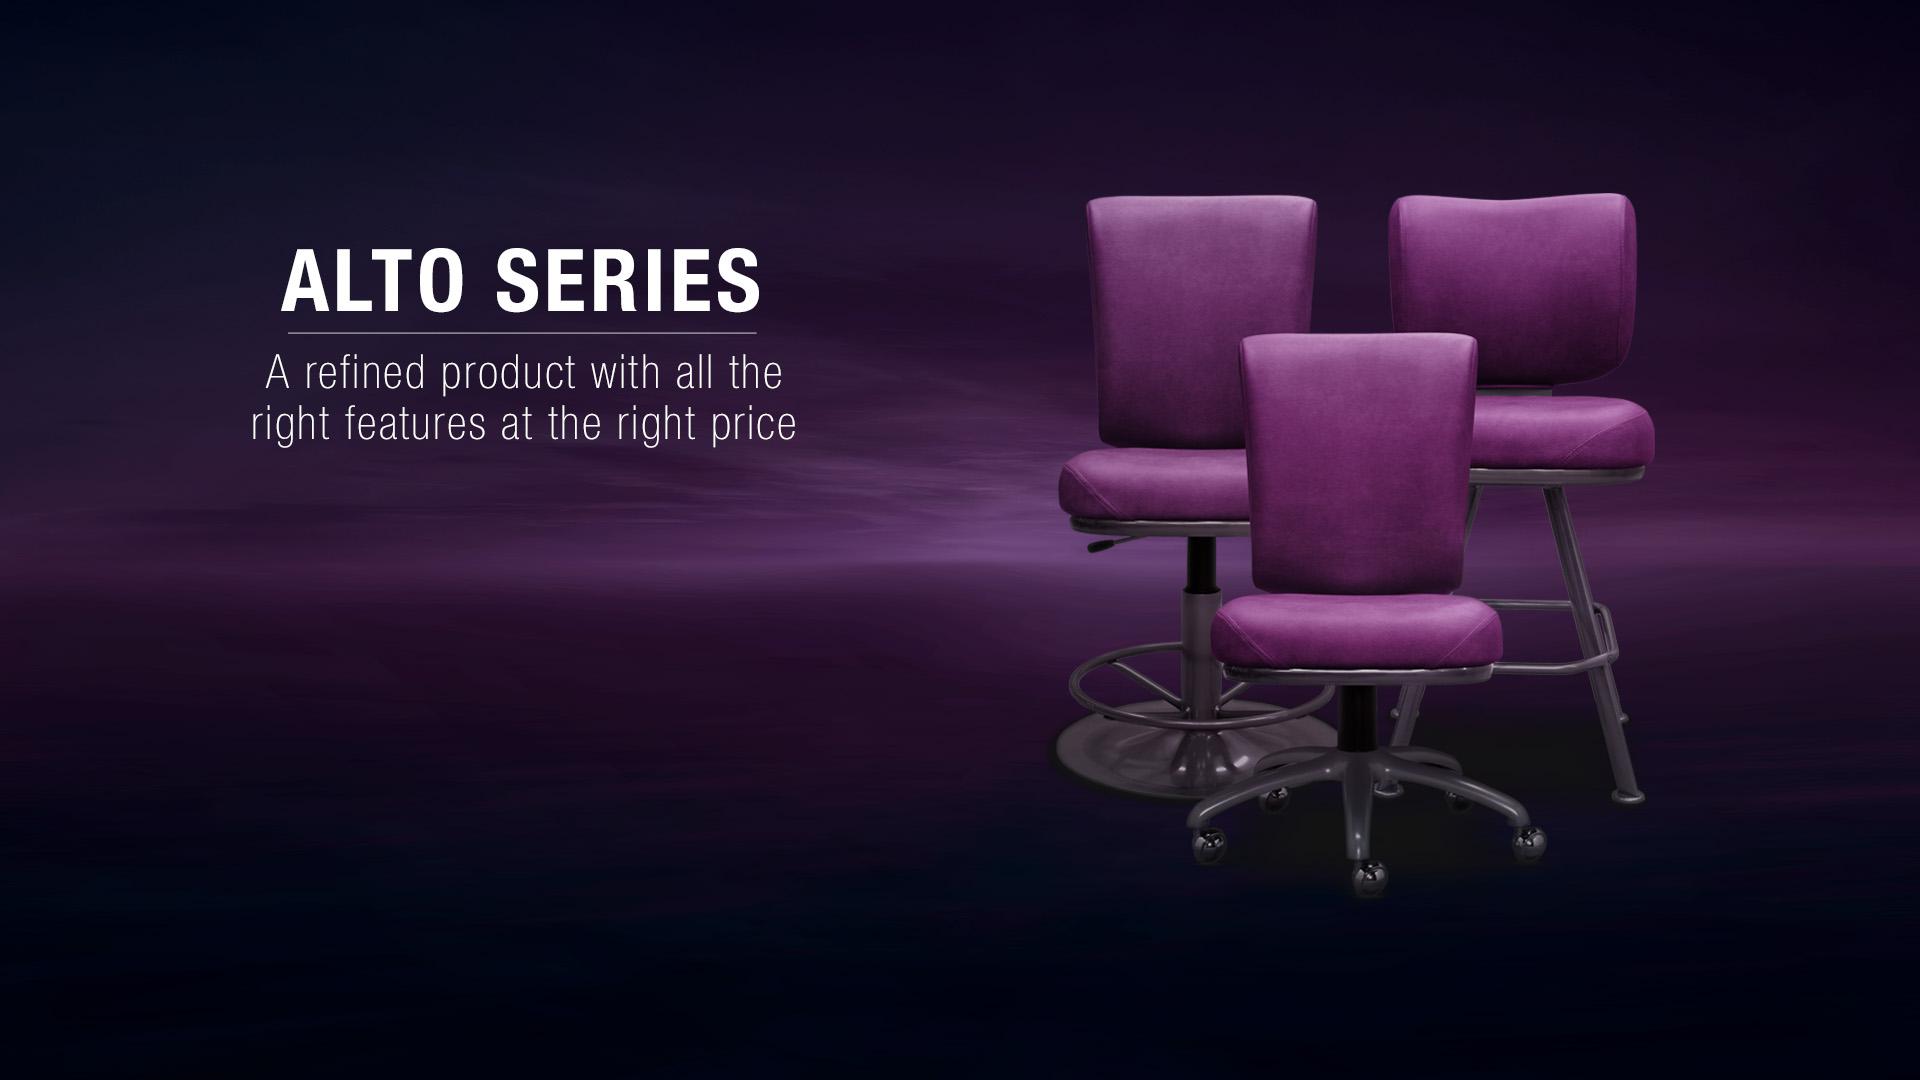 The Alto Series